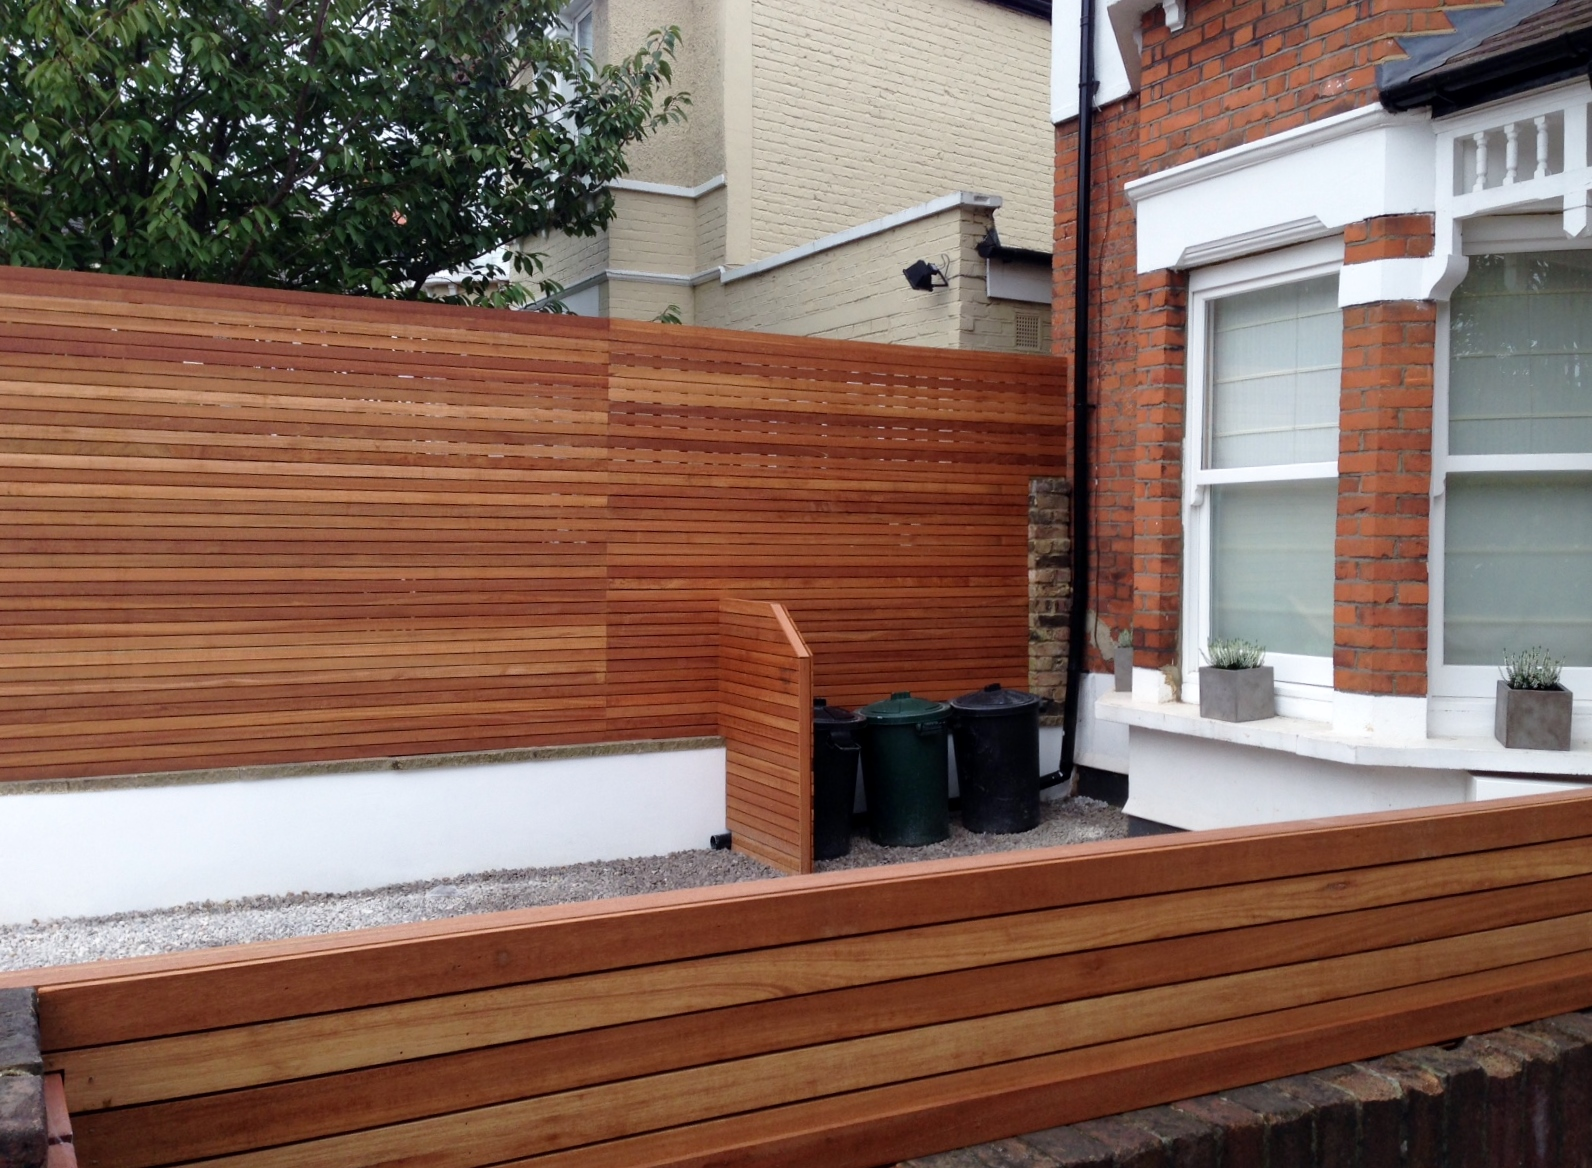 front garden drivewat gravel travertine paving path hardwood privacy screen trellis tooting london (17)